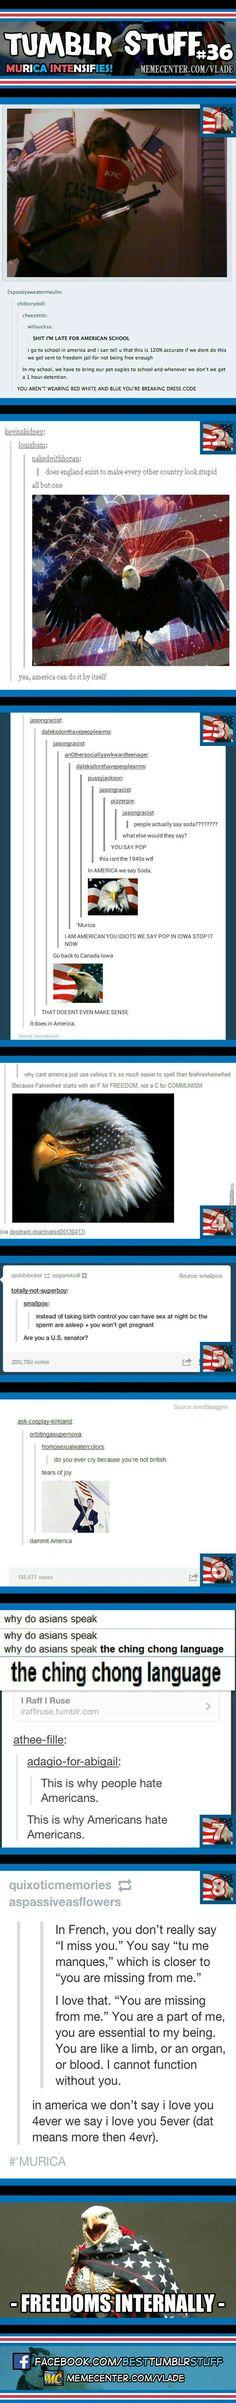 Gotta love good old American education amiright